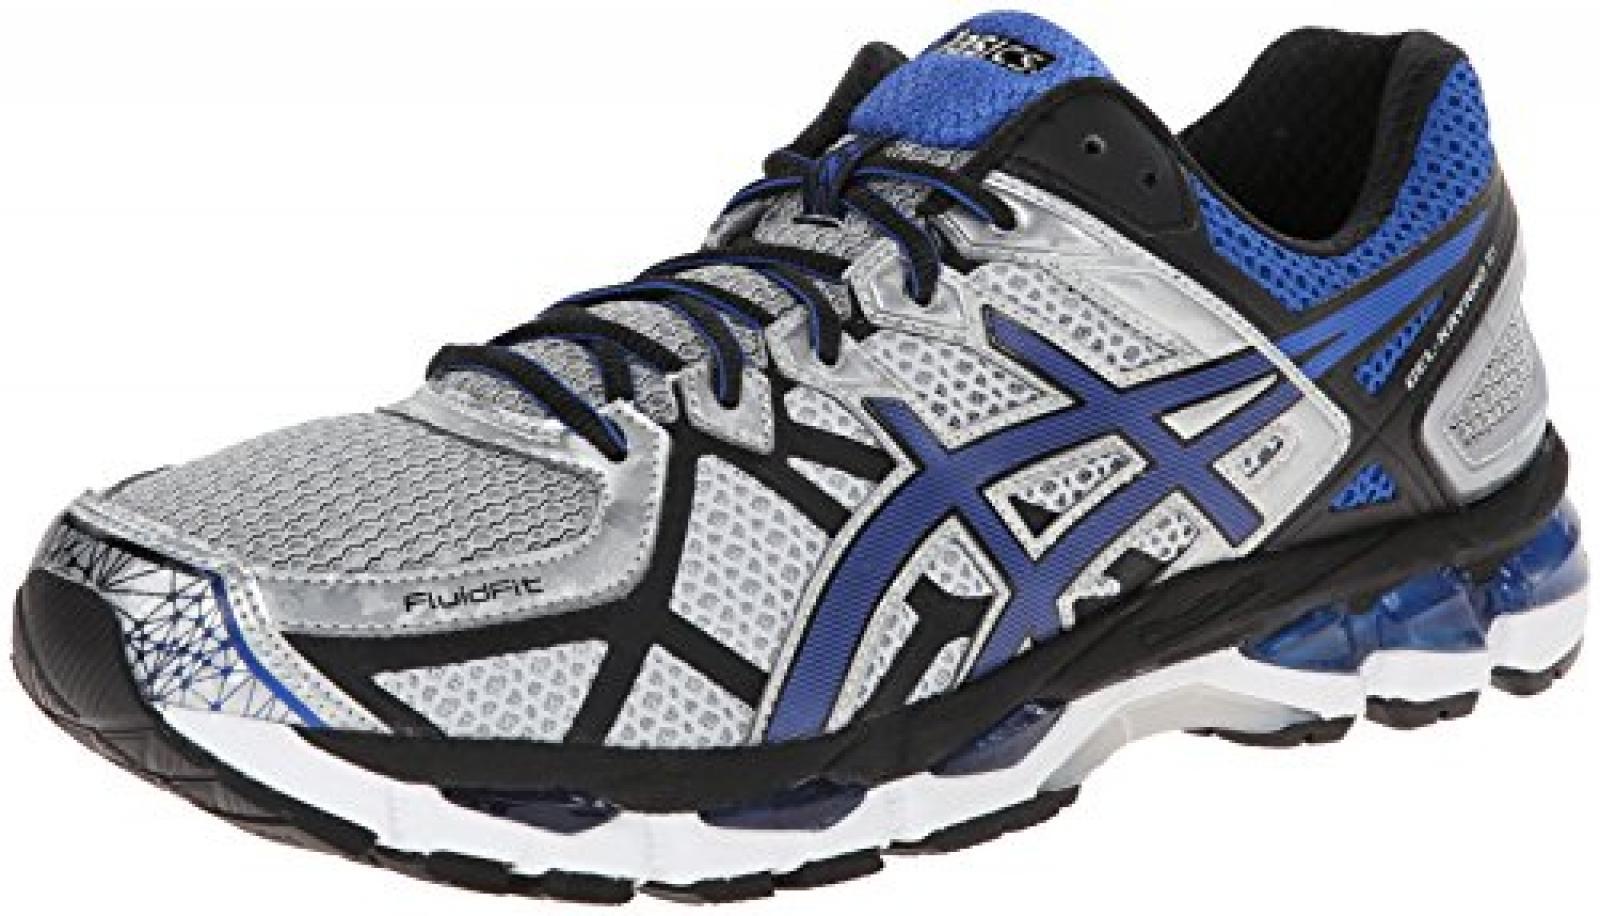 Asics - Herren-Gel-Kayano 21 Schuhe, EUR: 39, Lightning/Royal/Black